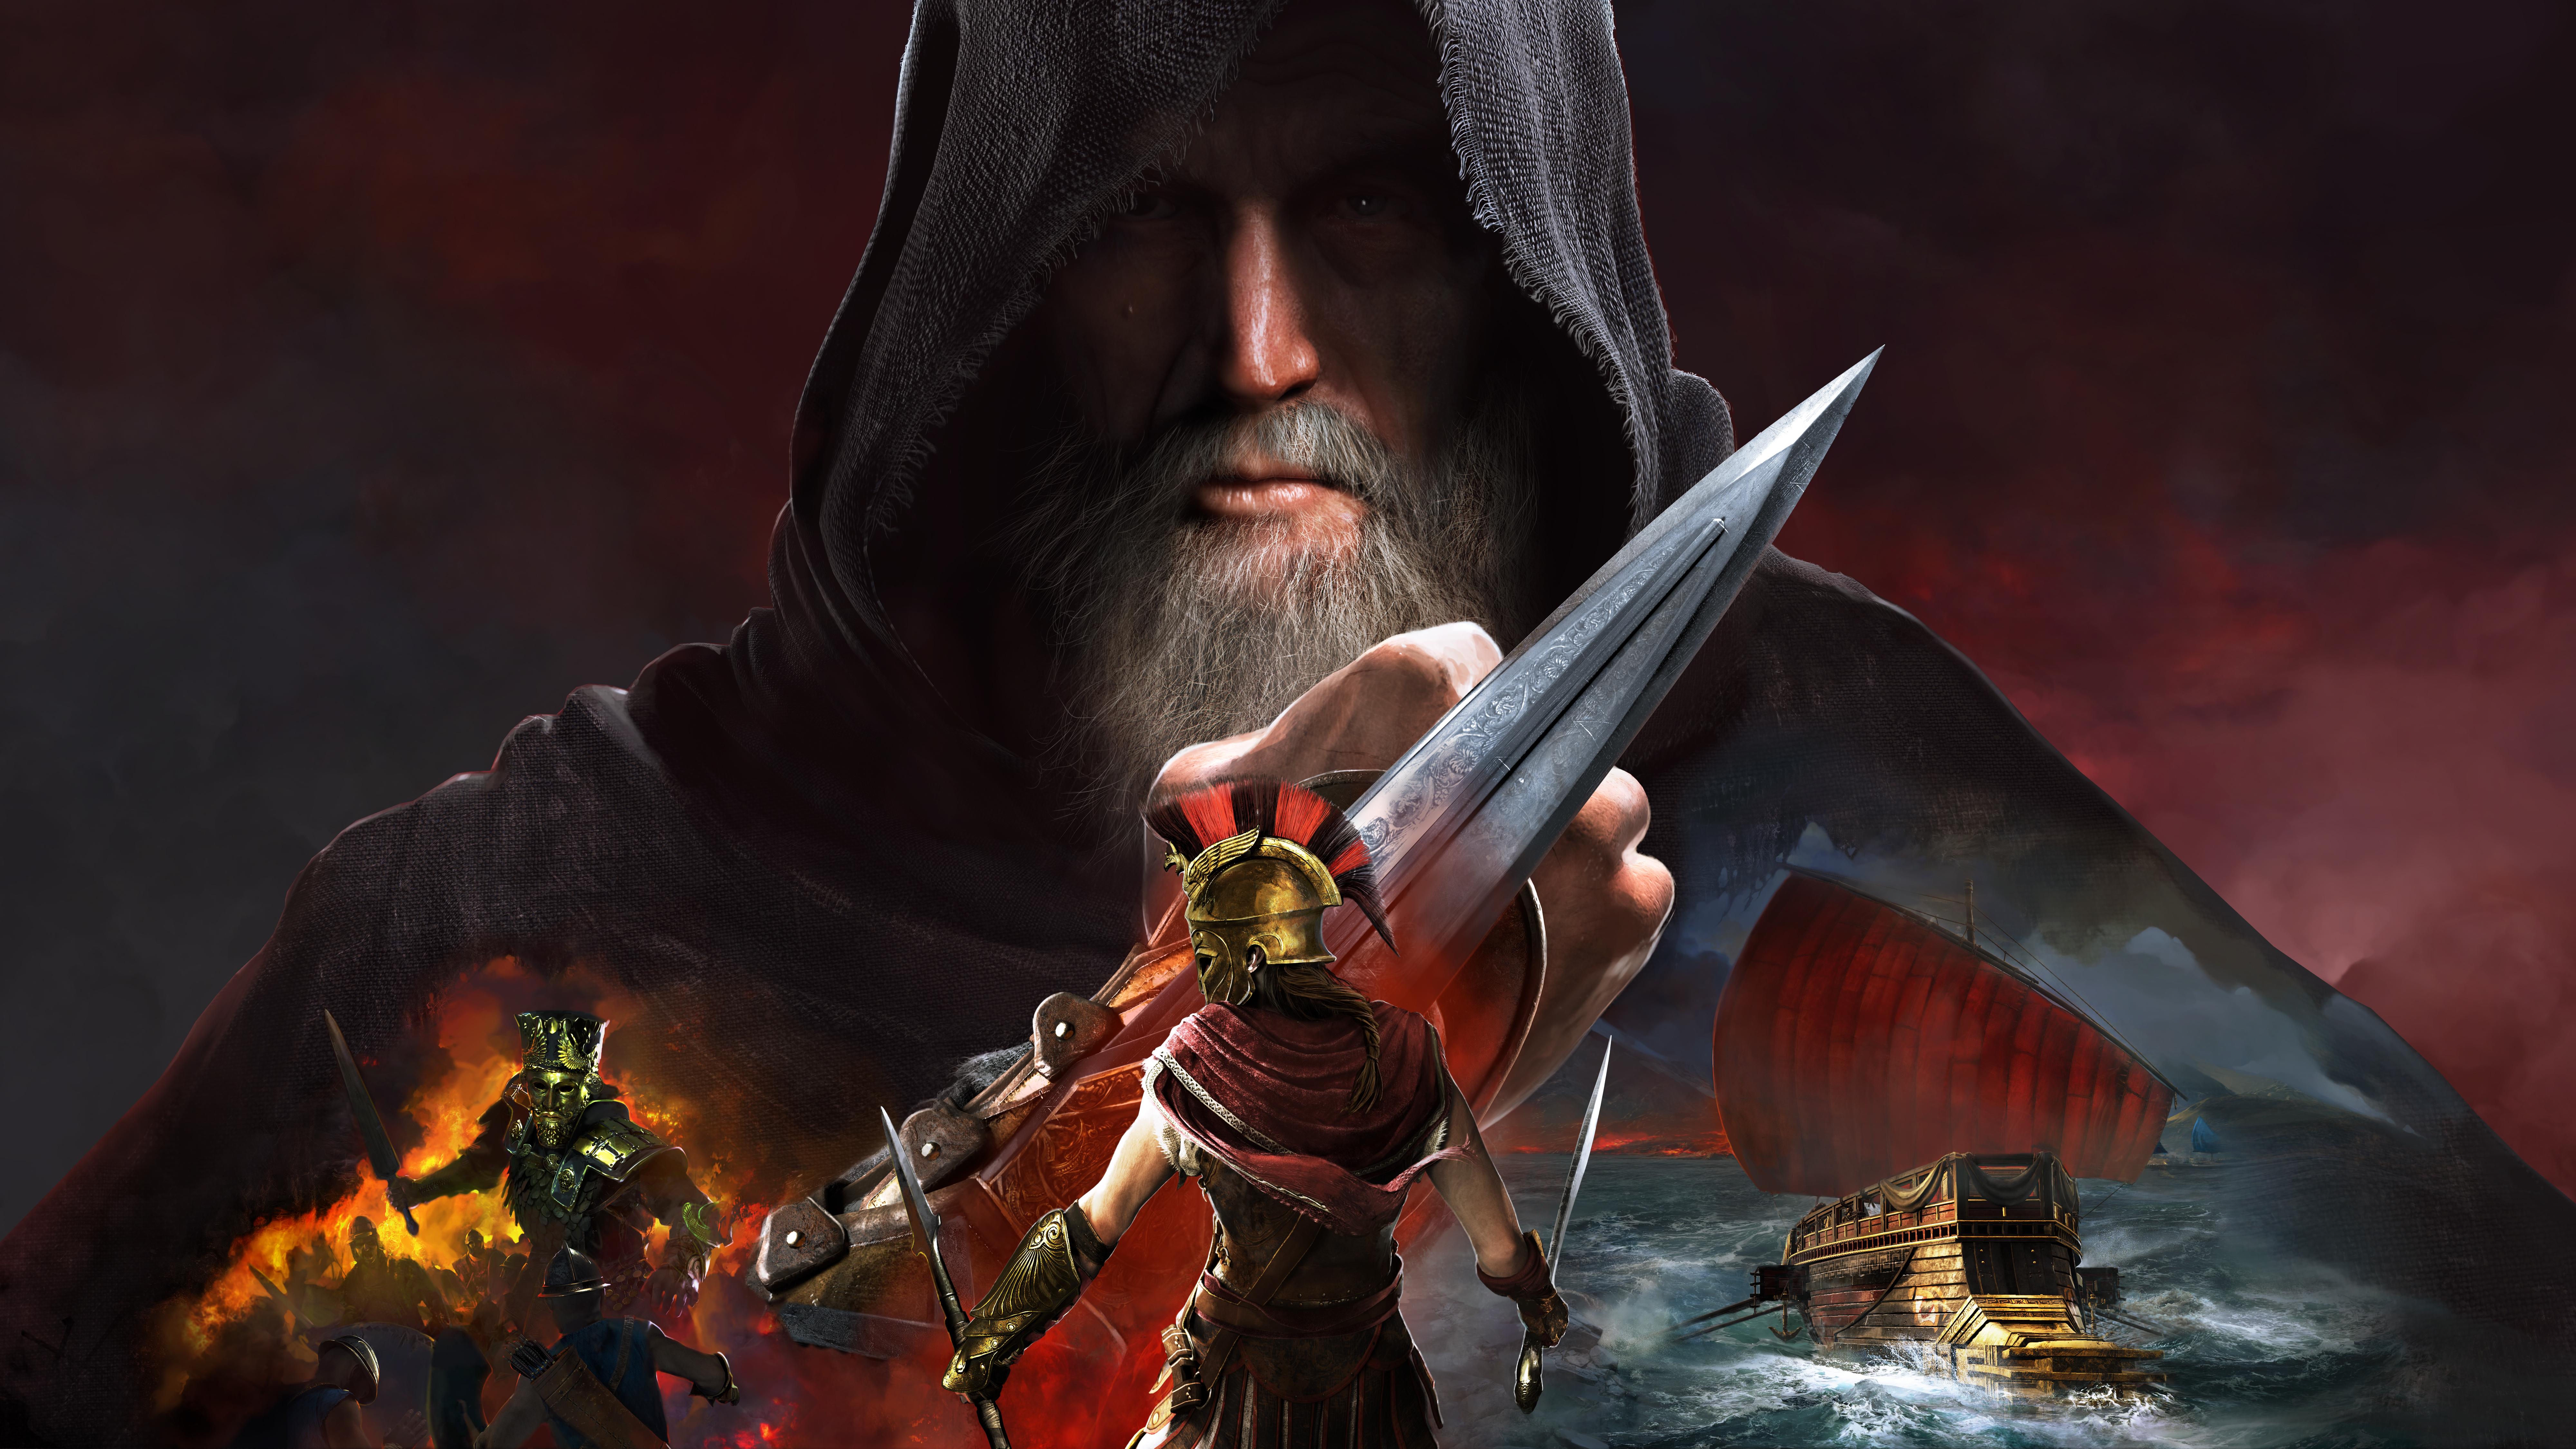 Assassinu0027s Creed Odyssey 4K 8K Wallpapers